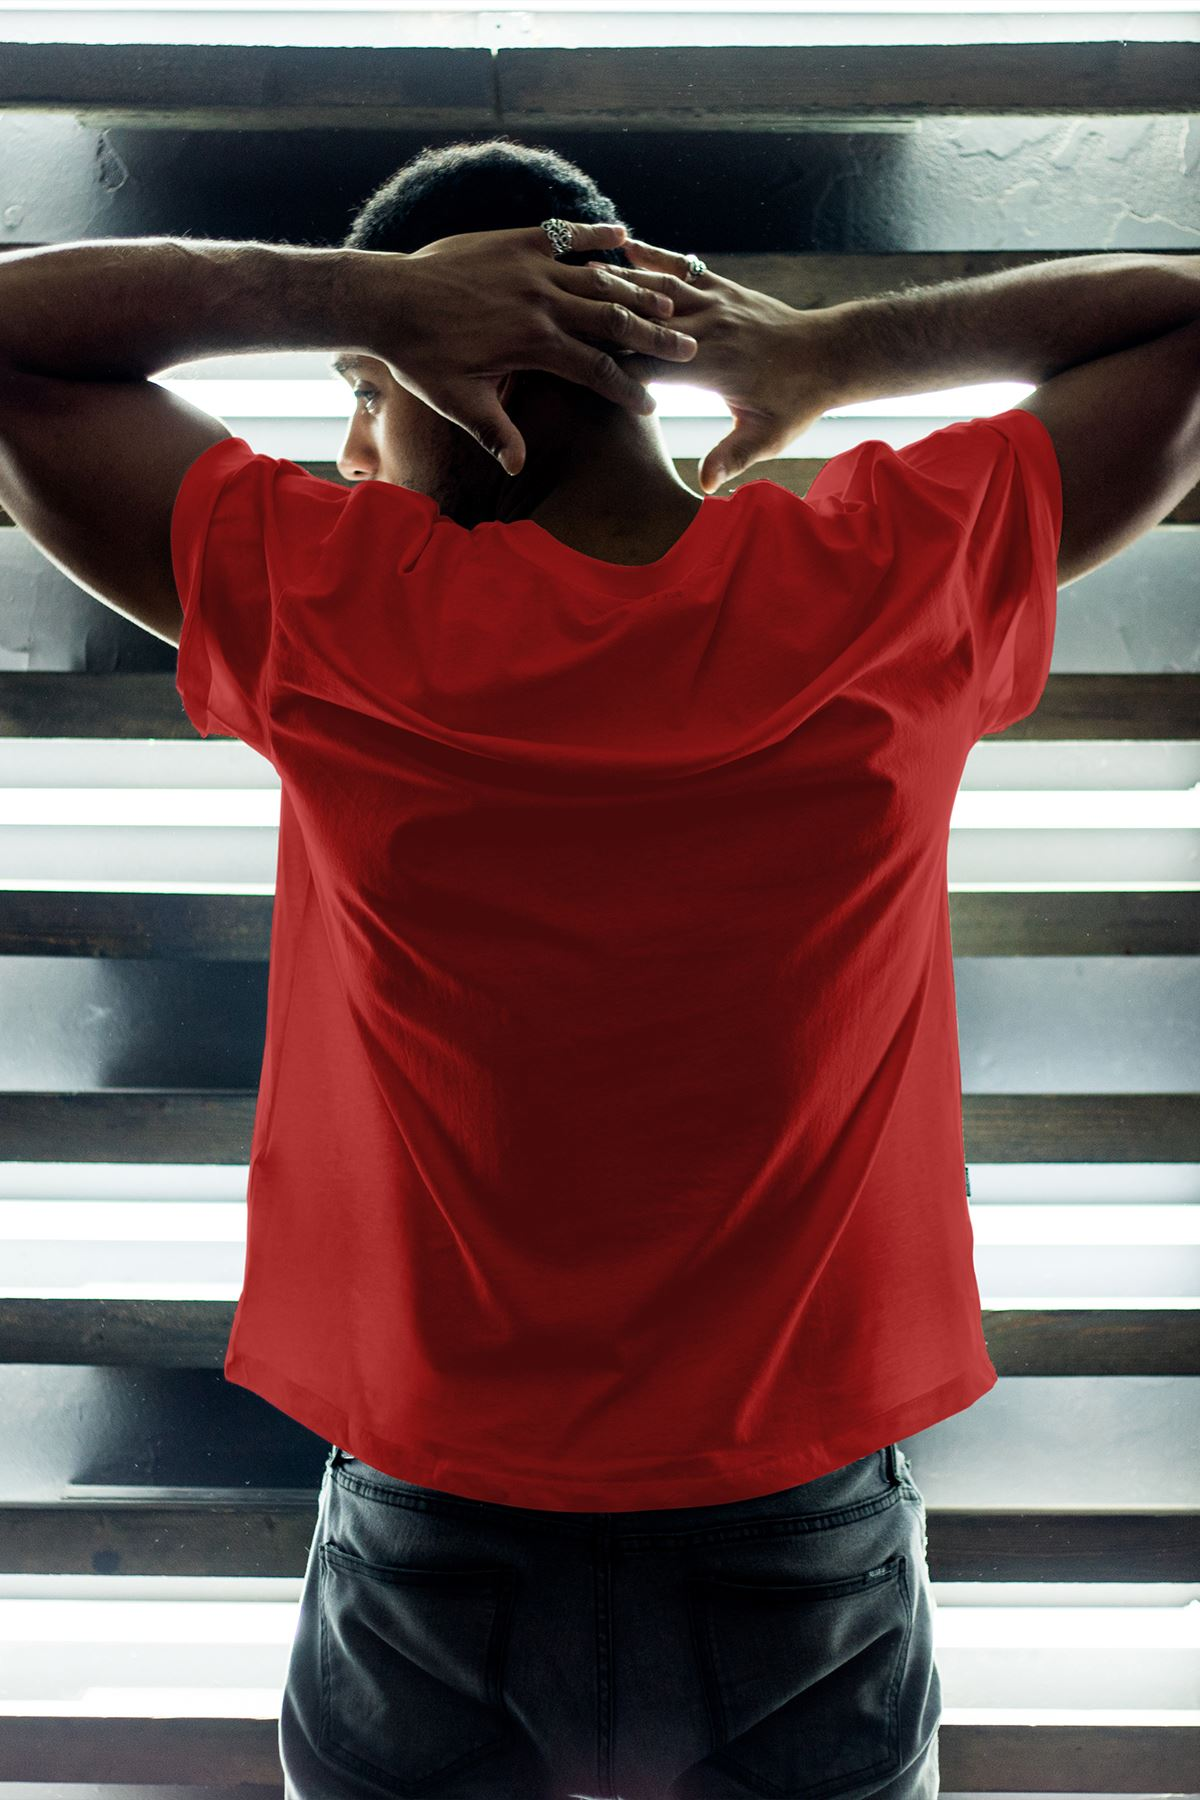 JumpMan Black Fon Kırmızı Erkek Oversize Tshirt - Tişört